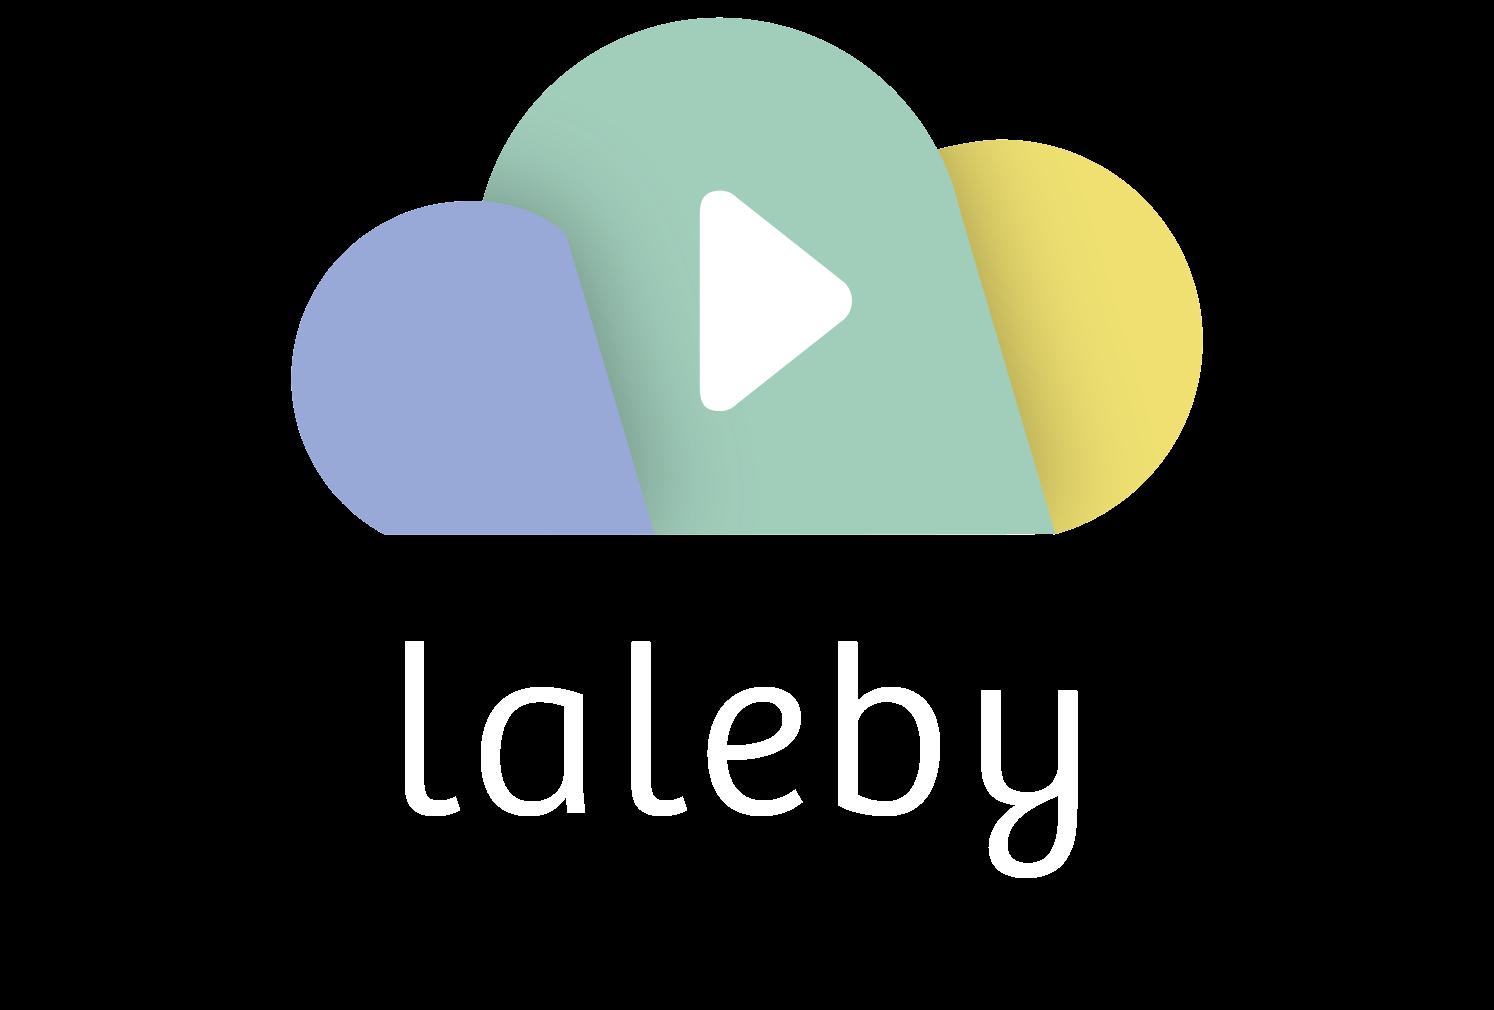 laleby